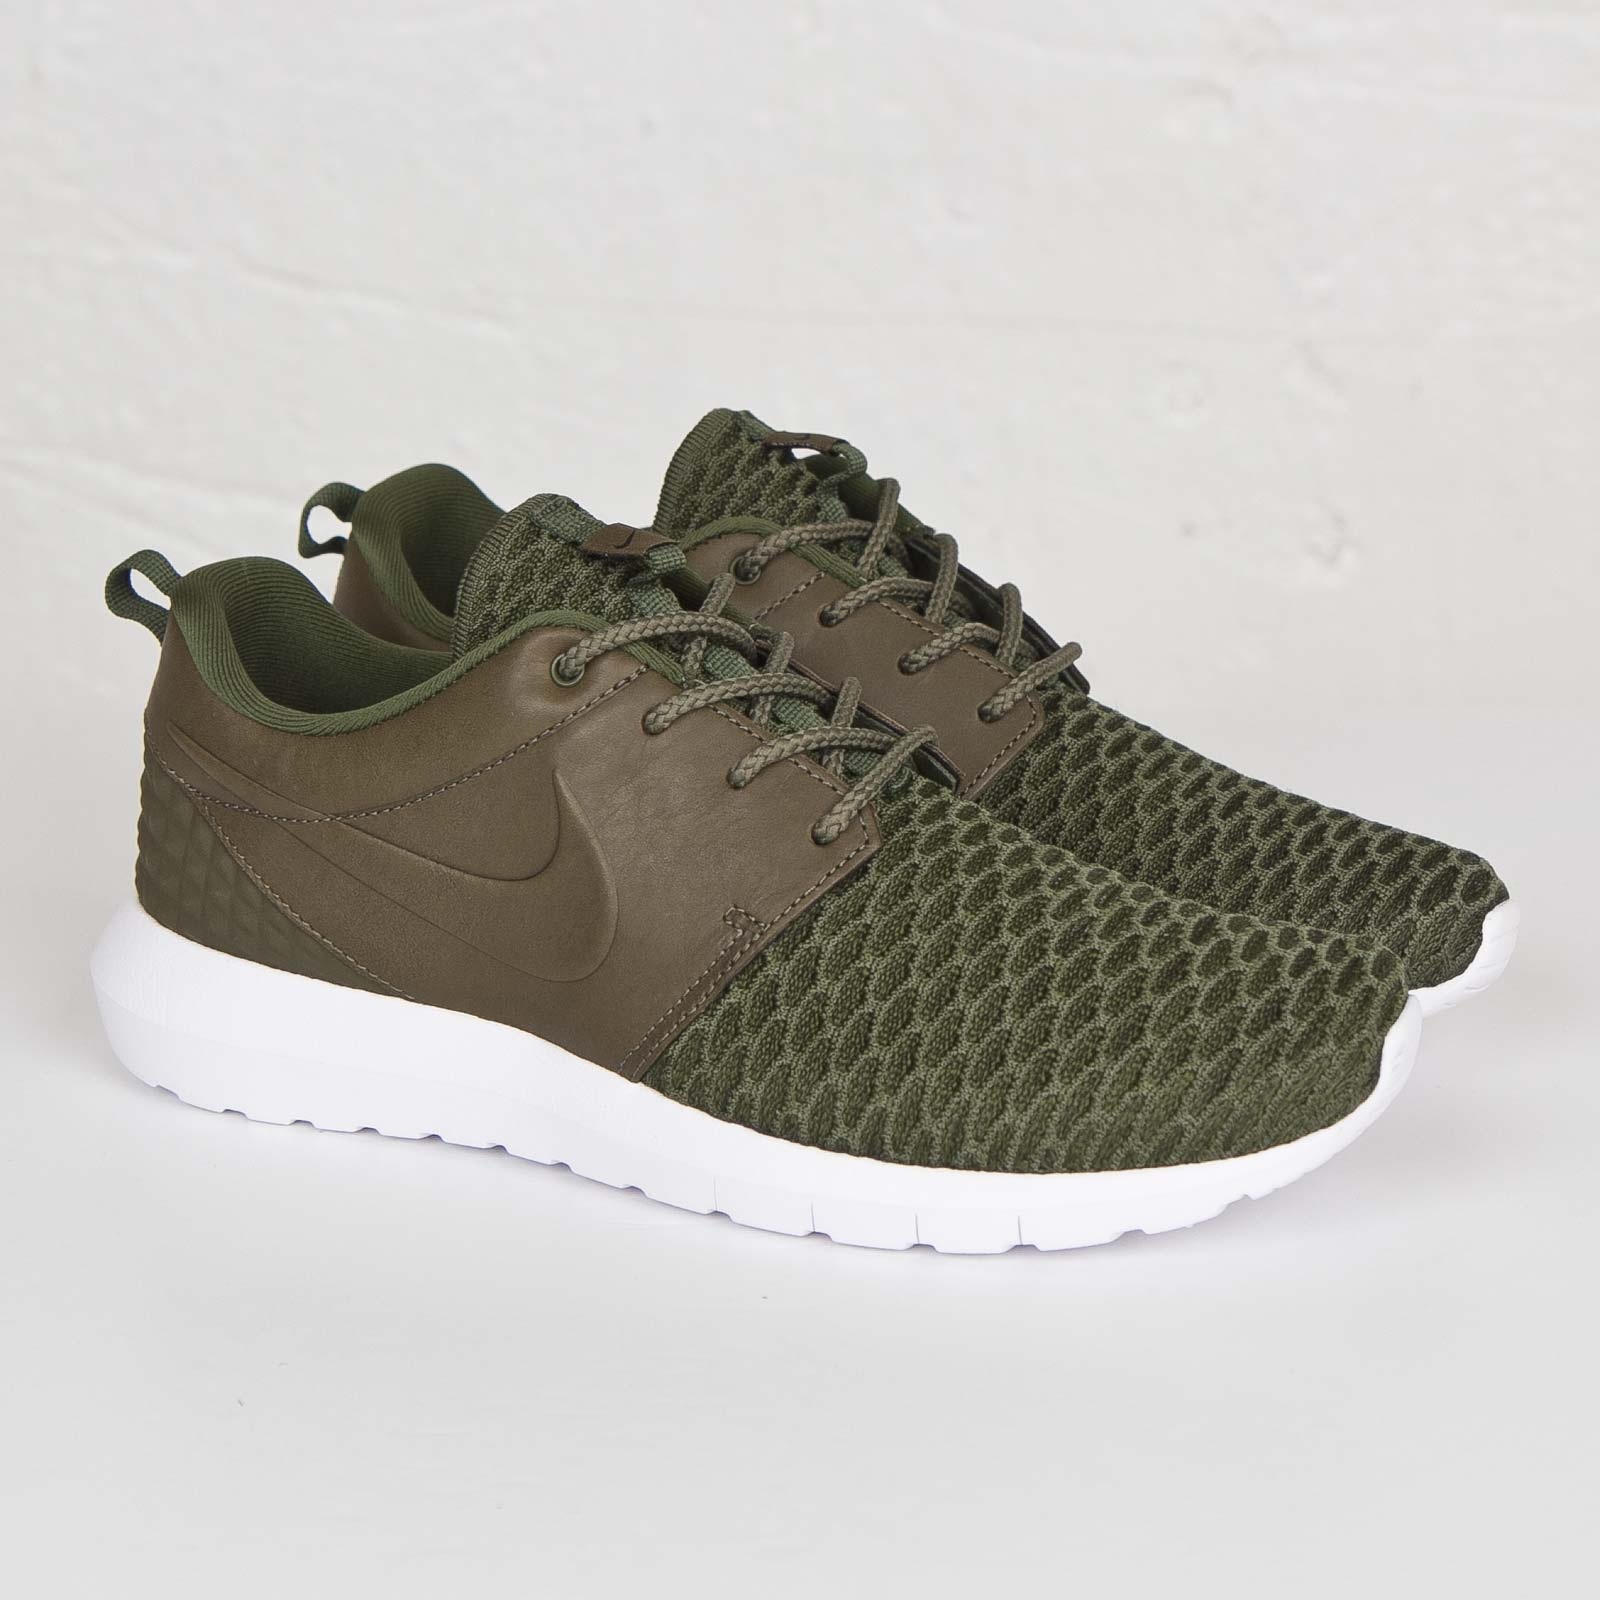 3cf3984a765bf Nike Roshe NM Flyknit Premium - 746825-300 - Sneakersnstuff ...